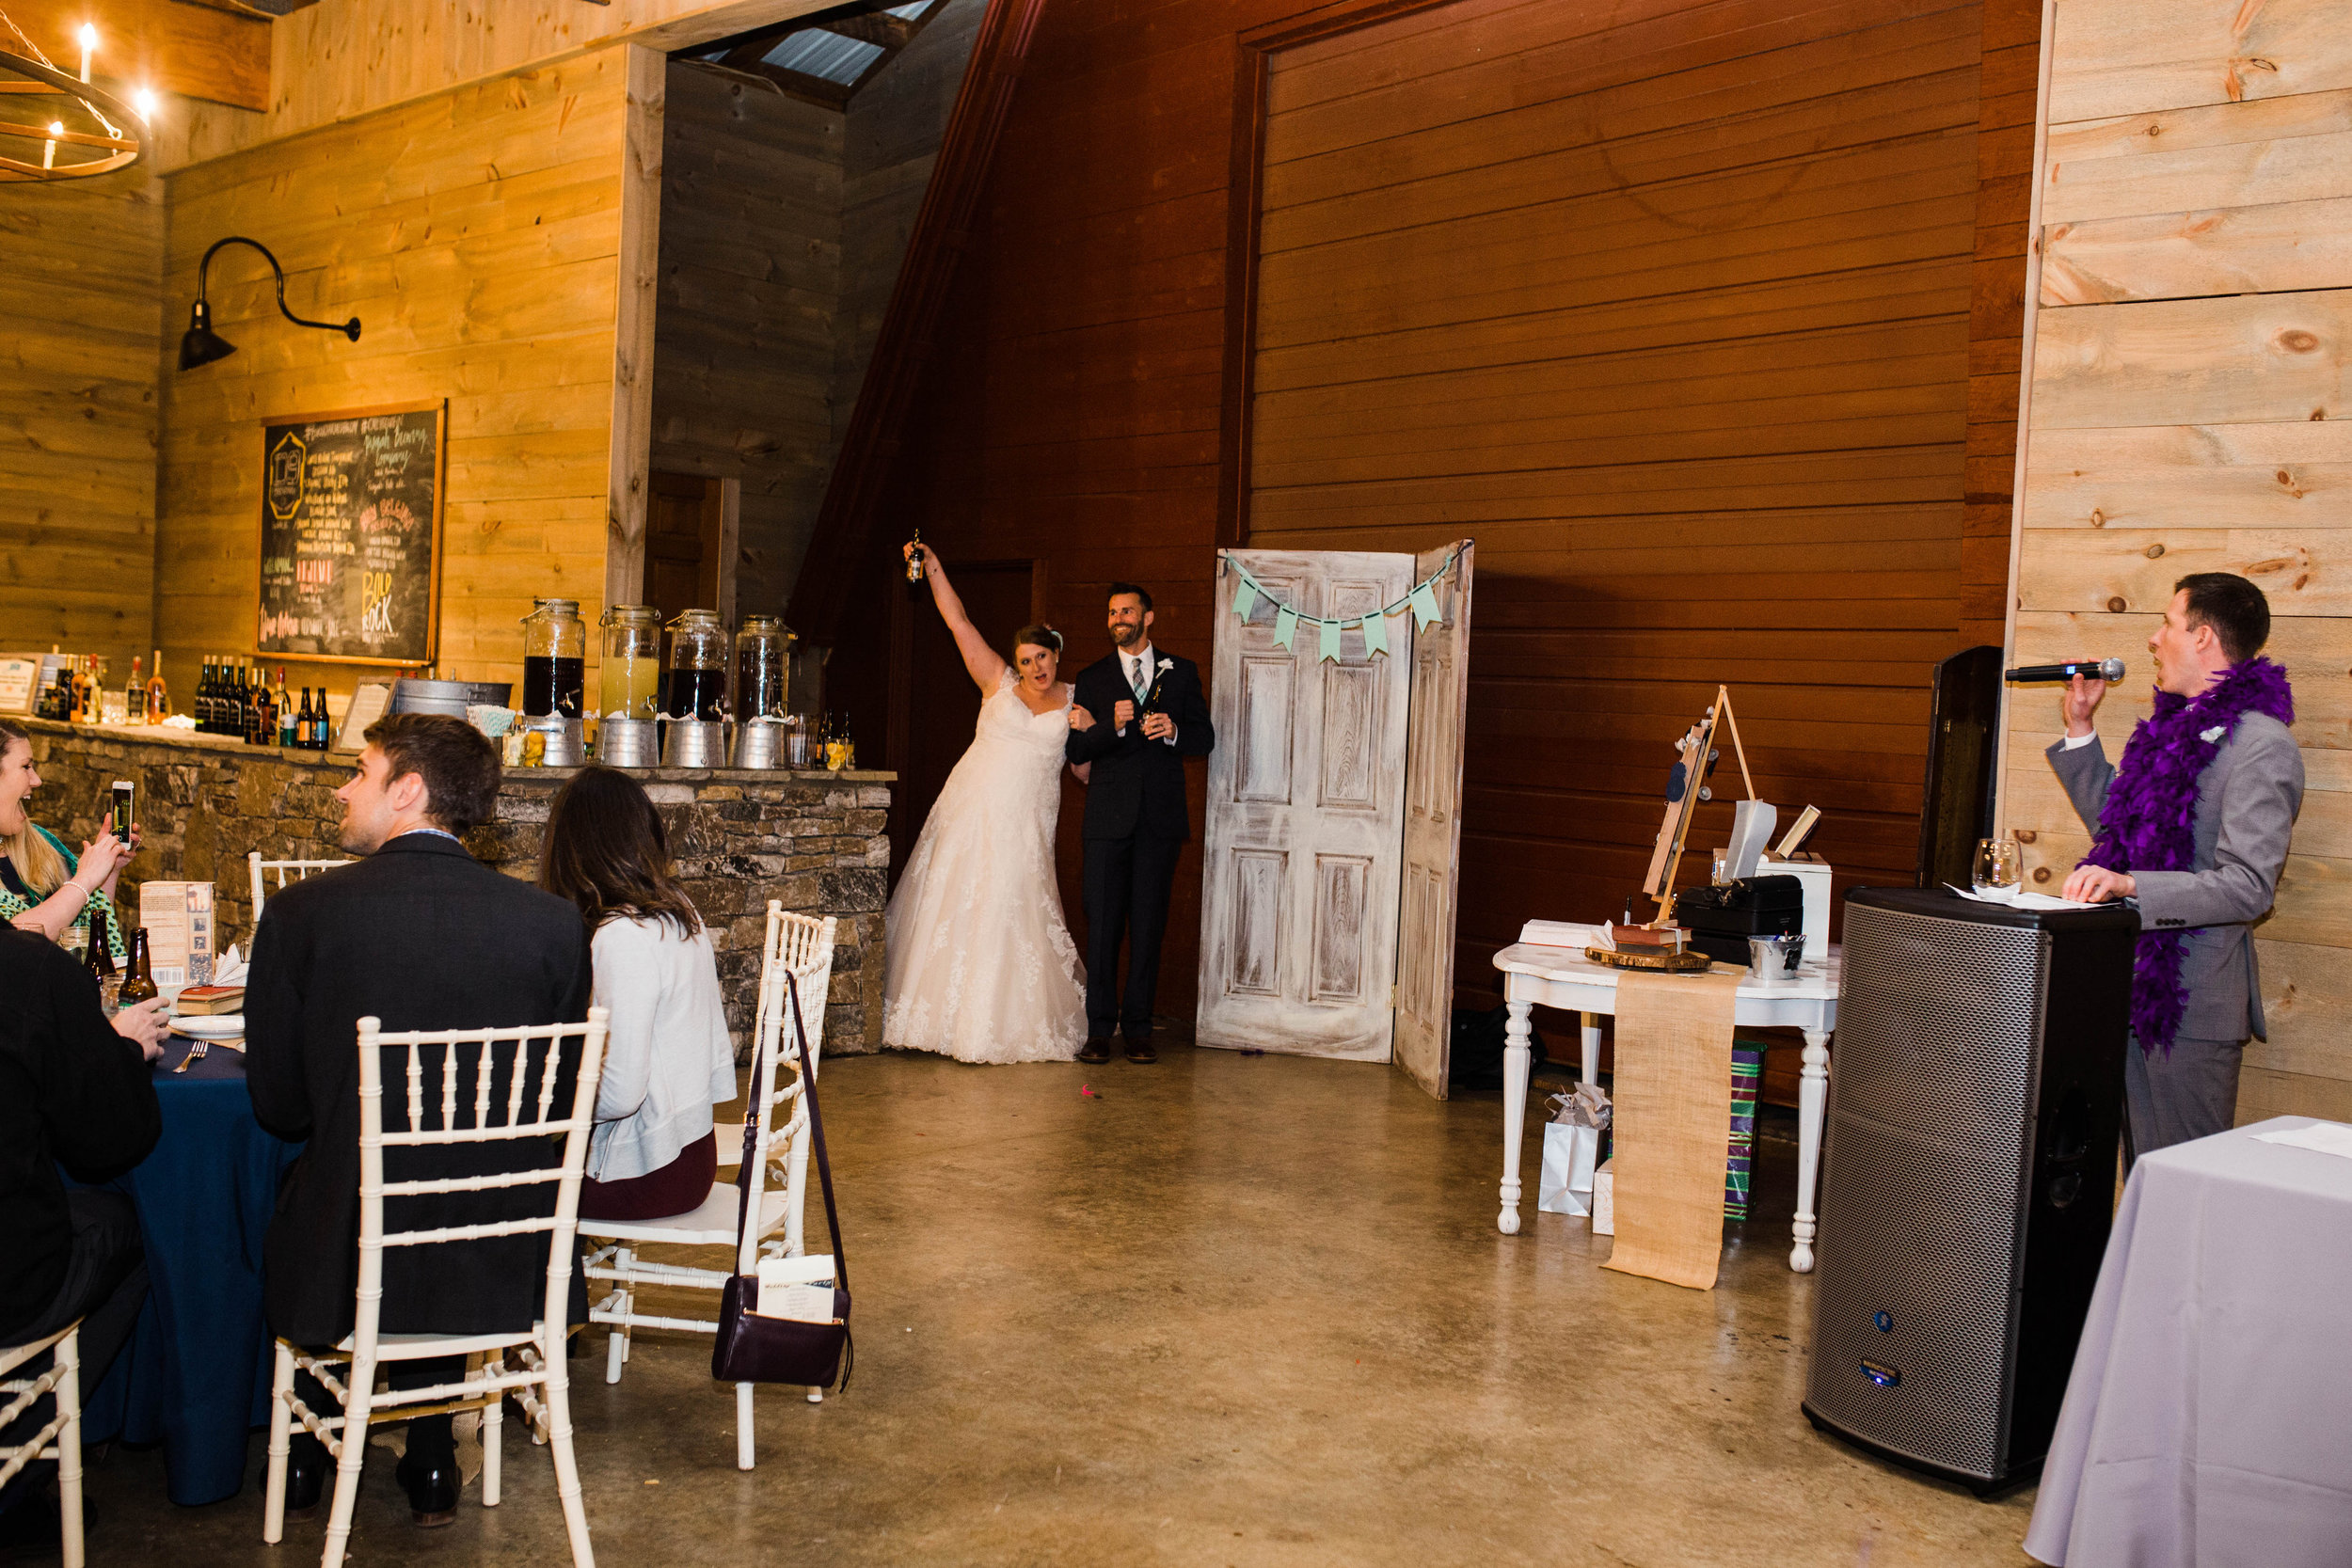 Honeysuckle-Hill-Weddings-Andrew-Rachel-235.jpg